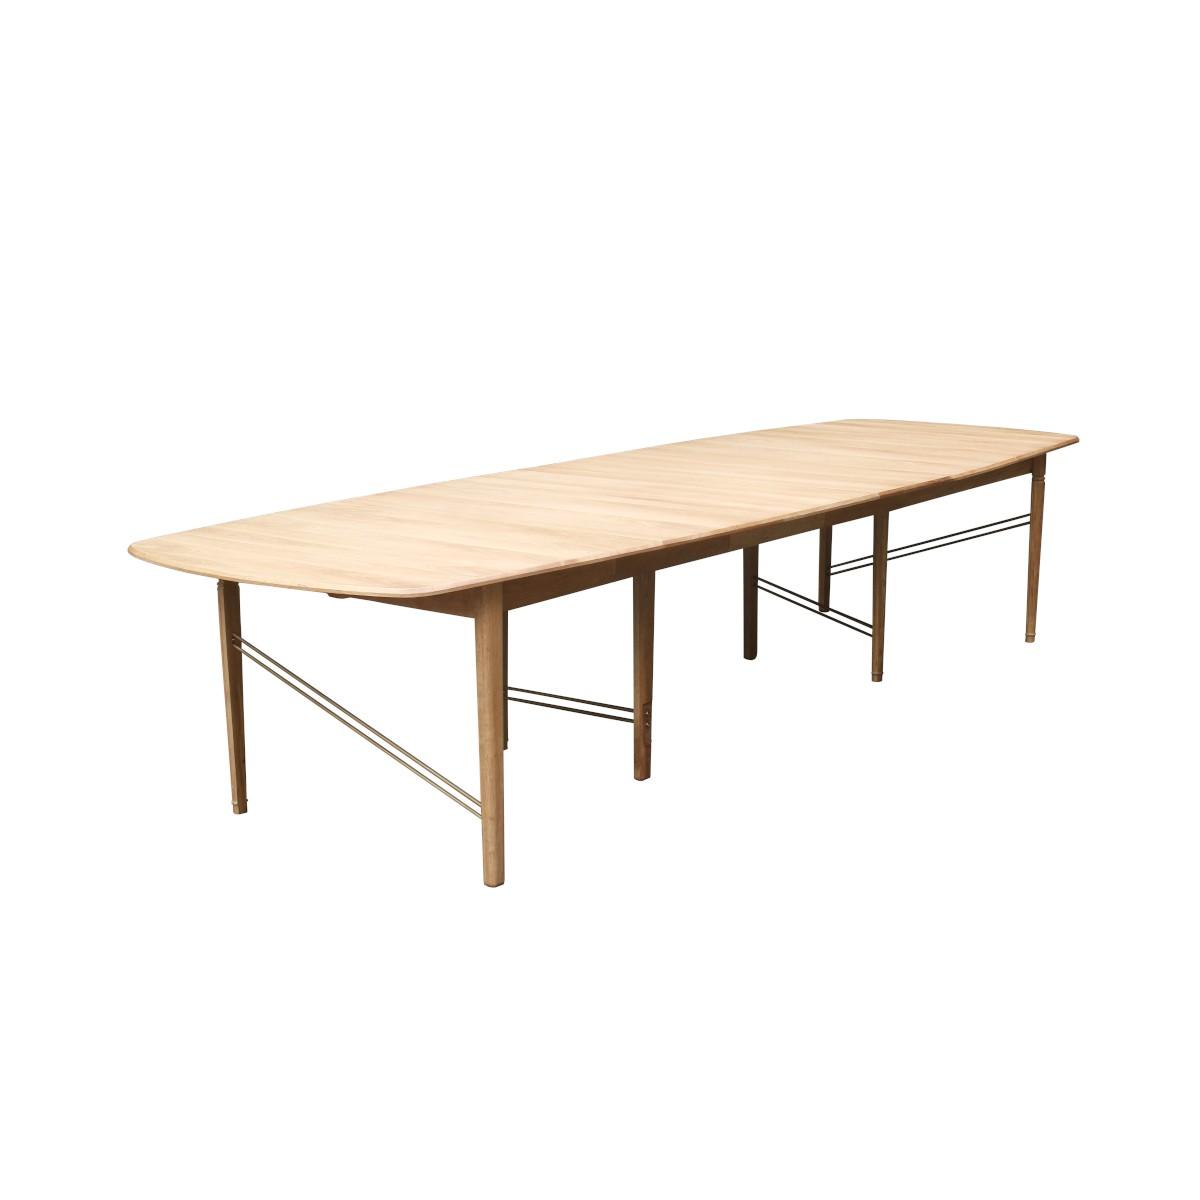 Grande table chêne clair naturel